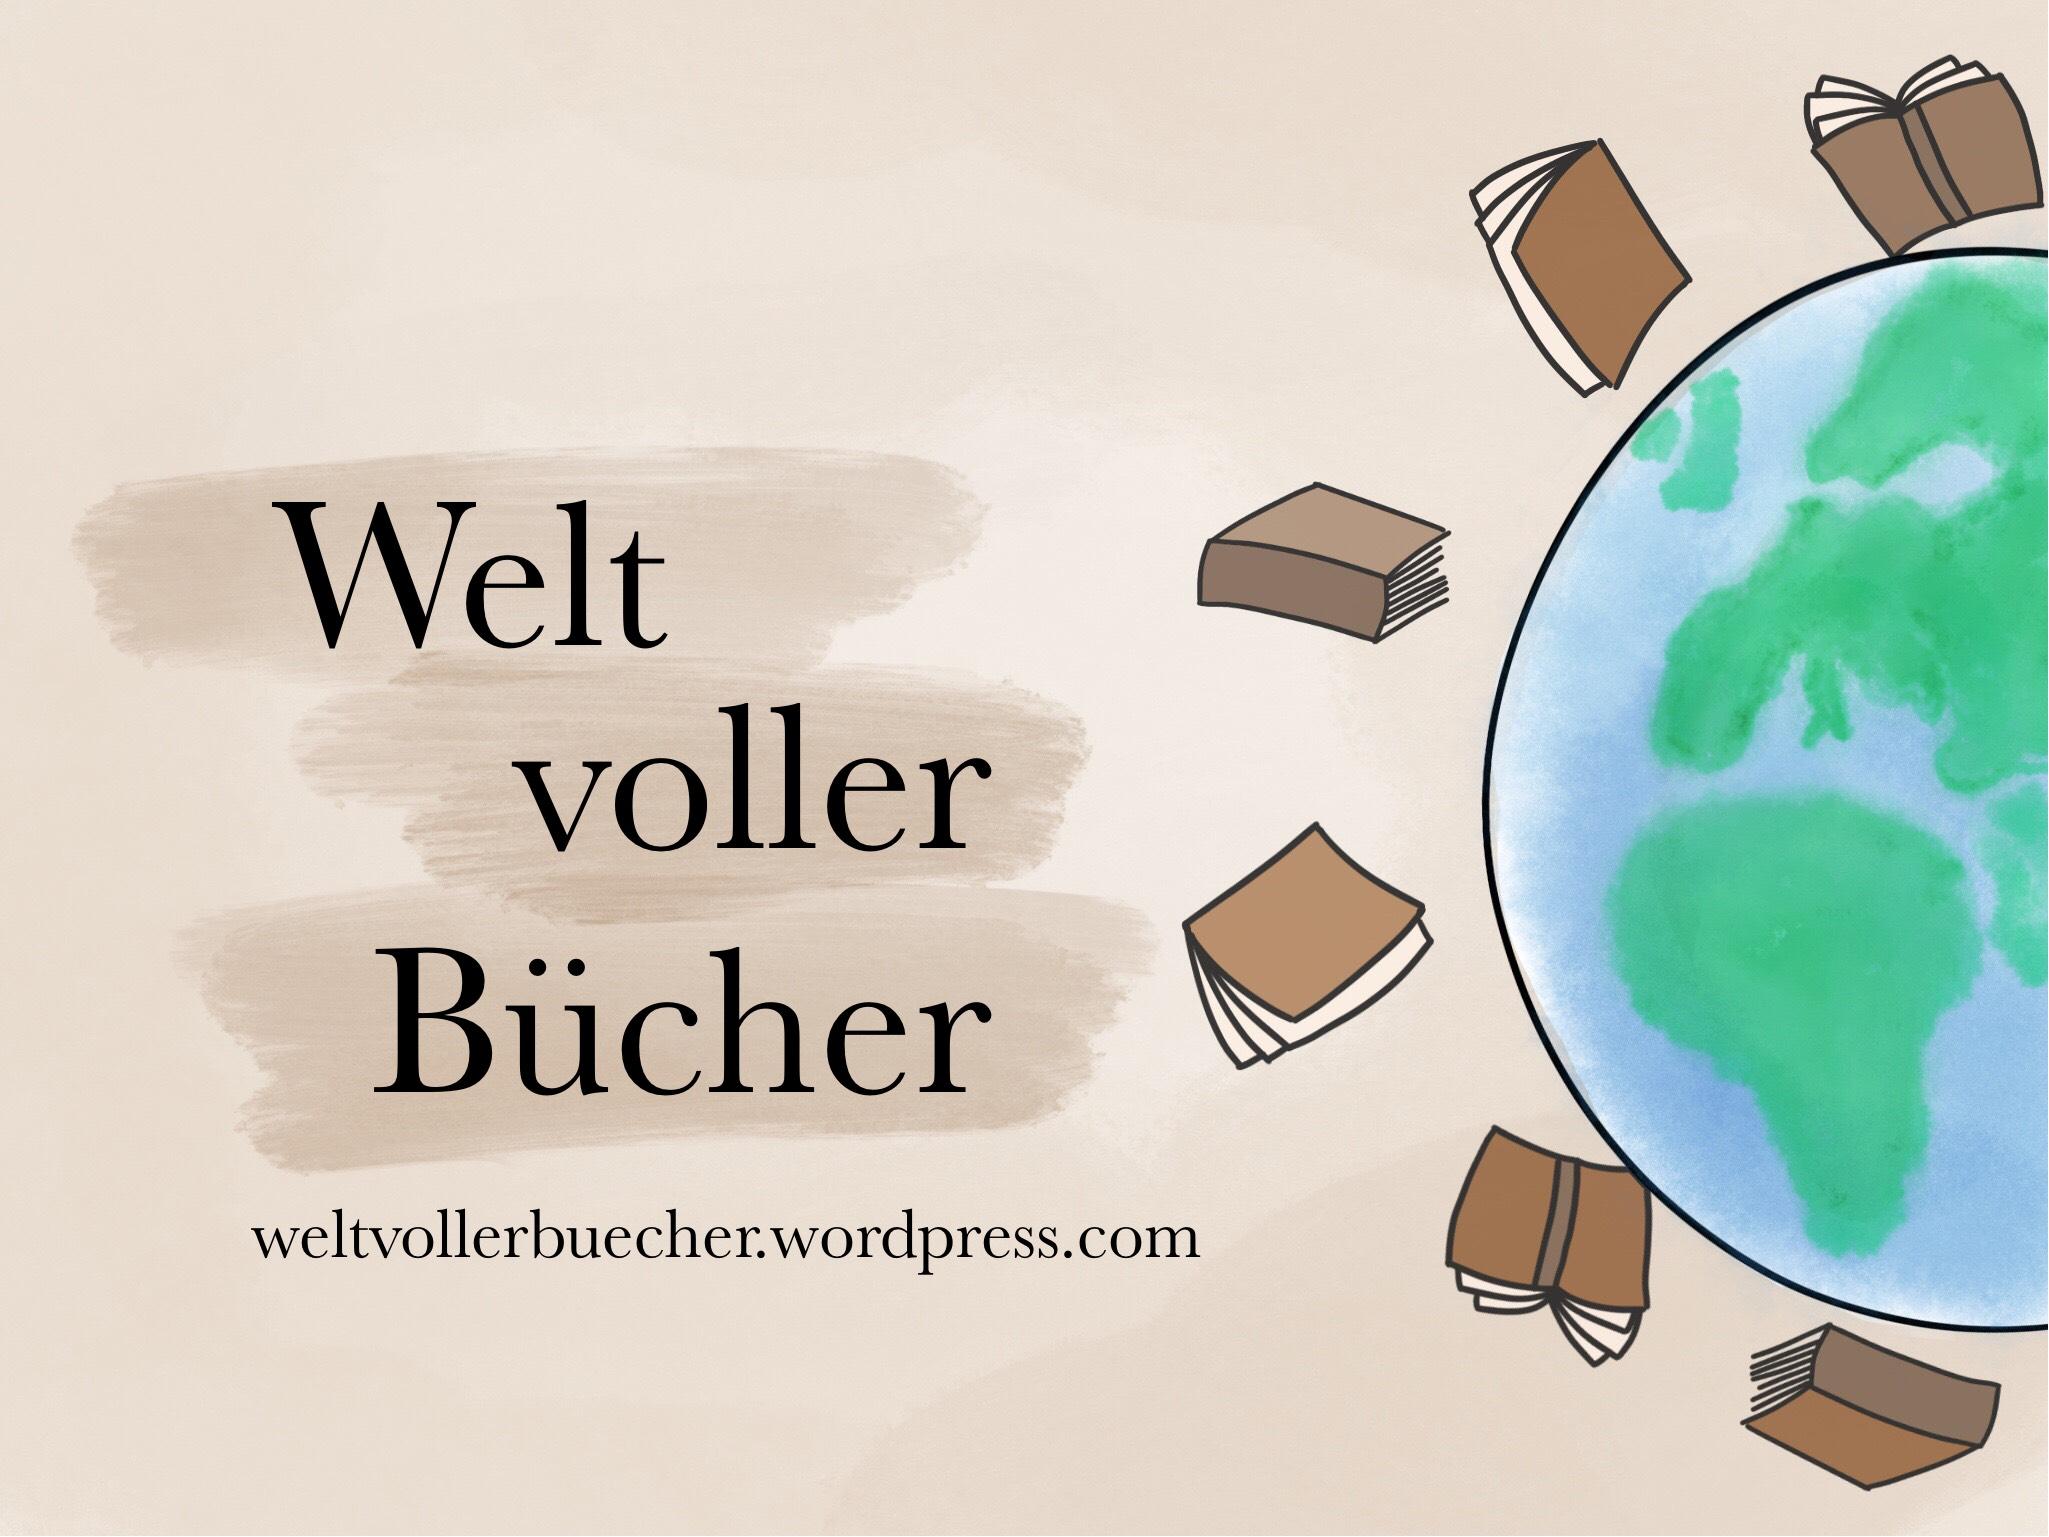 Welt voller Bücher